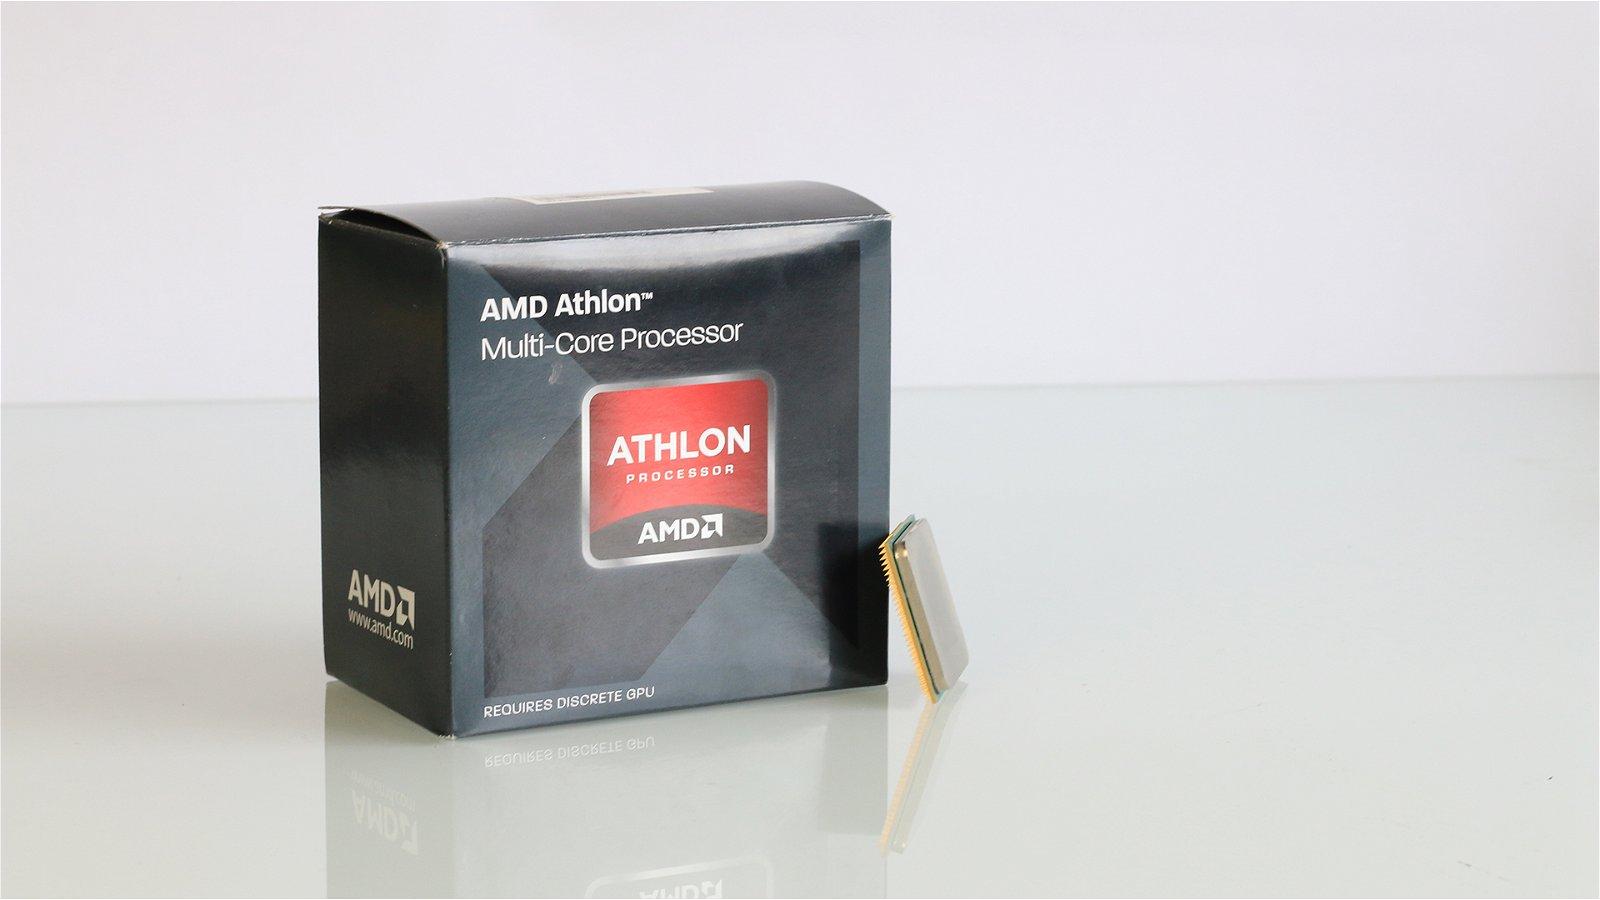 Amd Athlon X4 845 Quad Core Processor Review